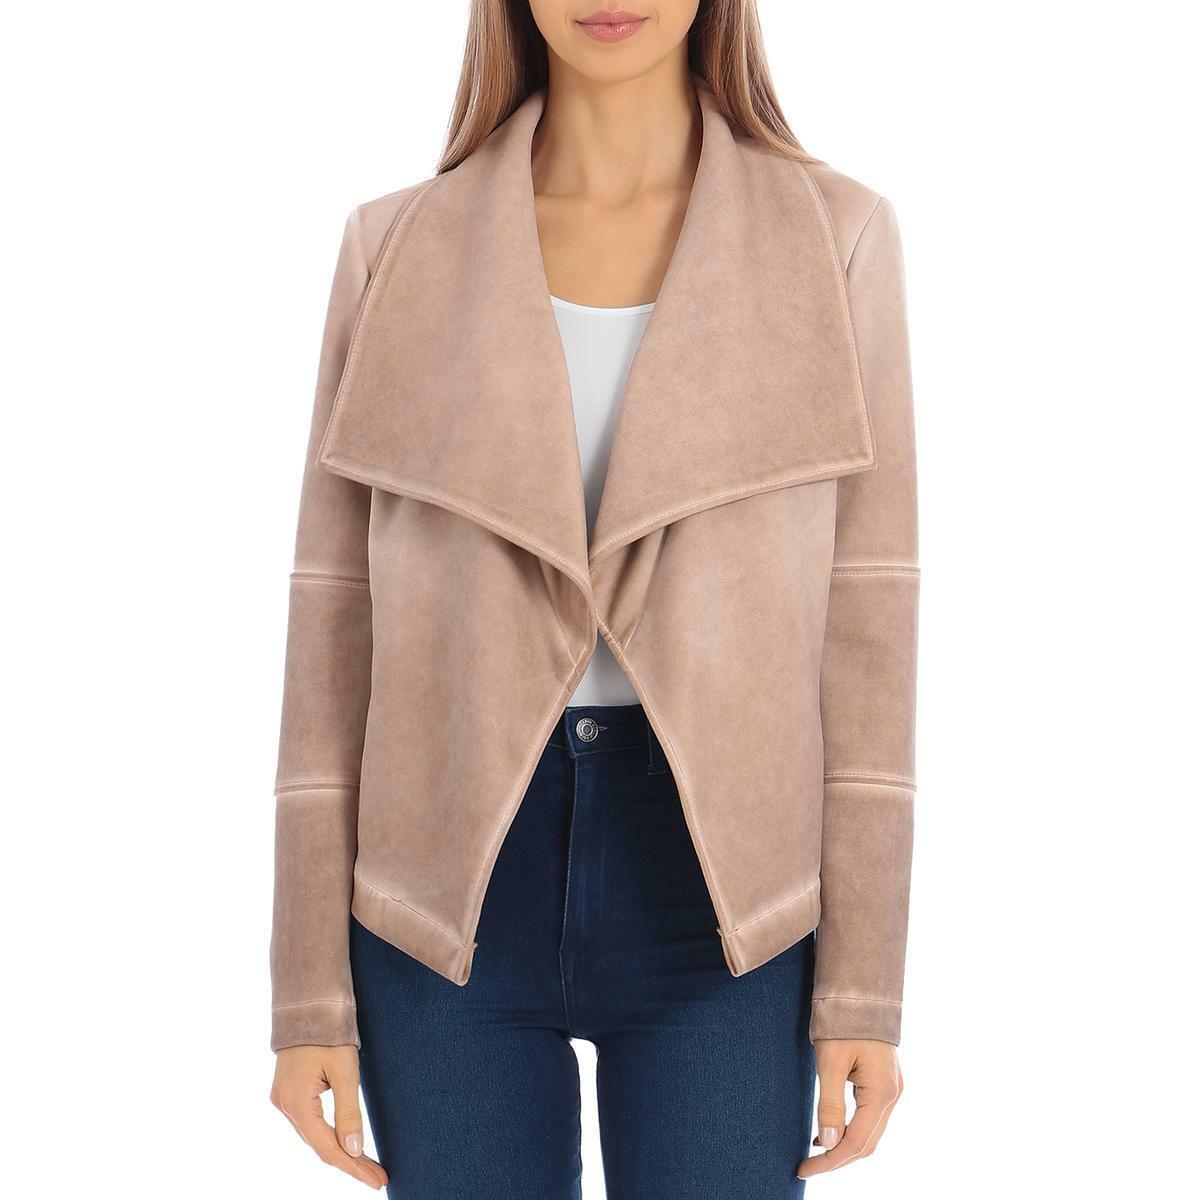 Bagatelle Womens Tan Faux Suede Washed Ou Jacket Coat L BHFO 0038